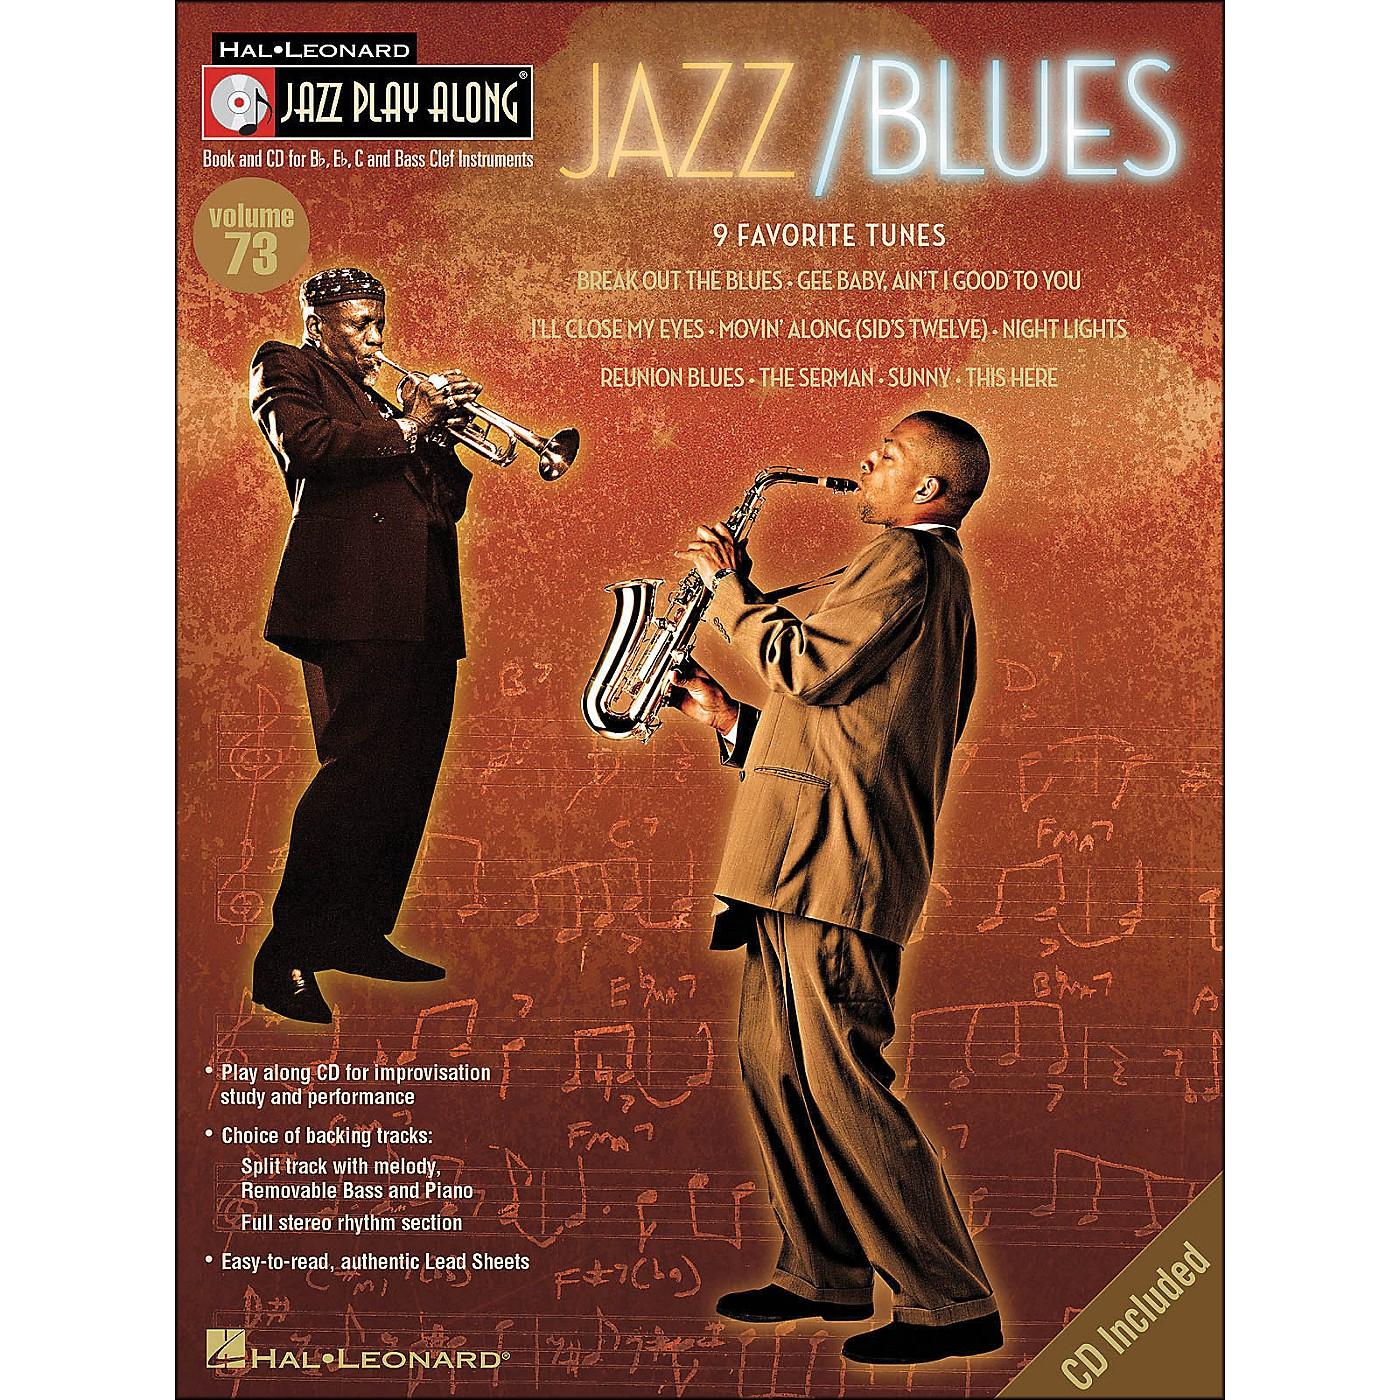 Hal Leonard Jazz/Blues Volume 73 Book/CD Jazz Play Along thumbnail